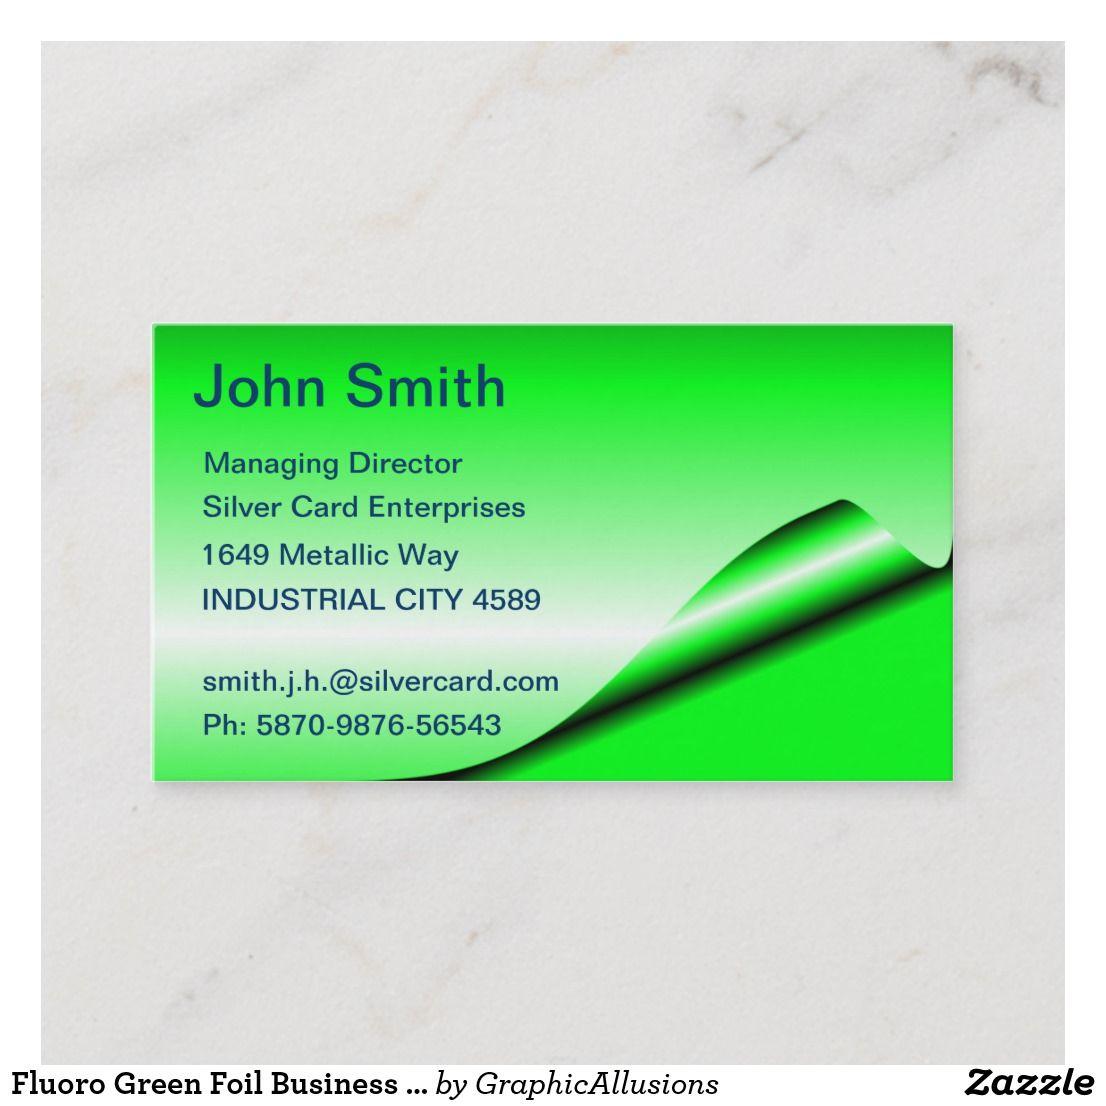 Fluoro Green Foil Business Cards Zazzle Com In 2021 Foil Business Cards Business Cards Cards